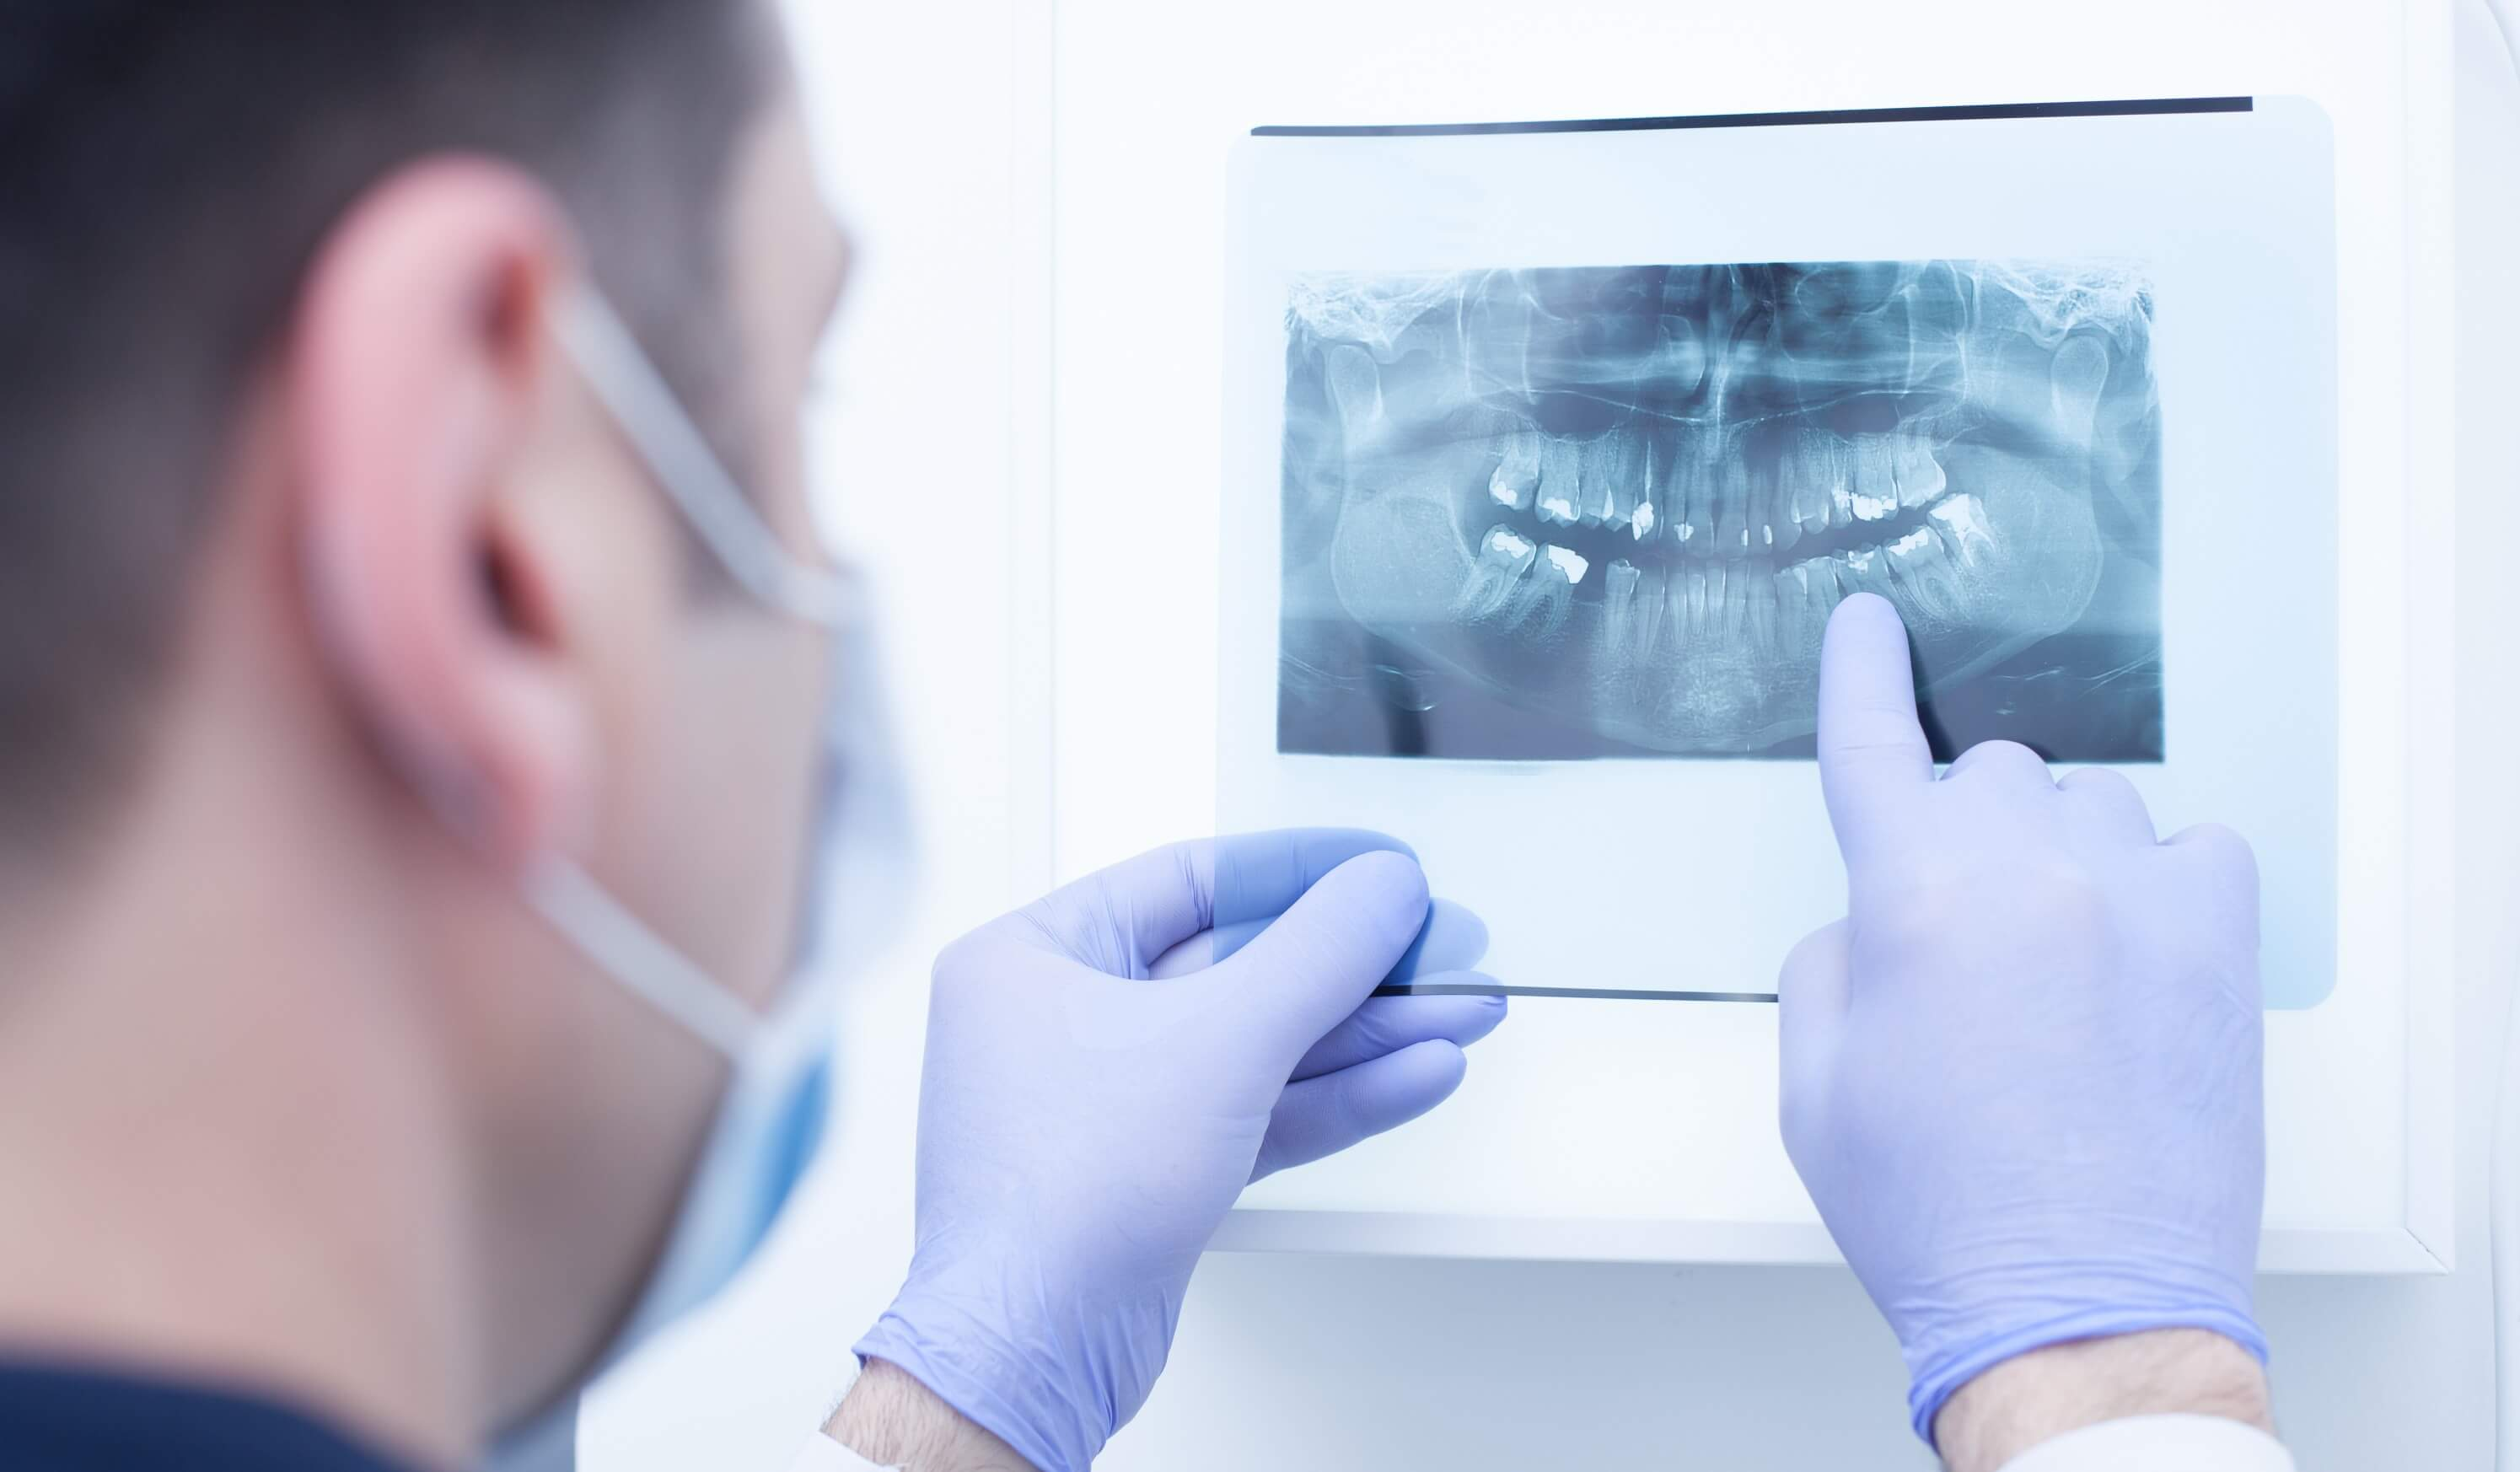 צילום רנטגן שיניים